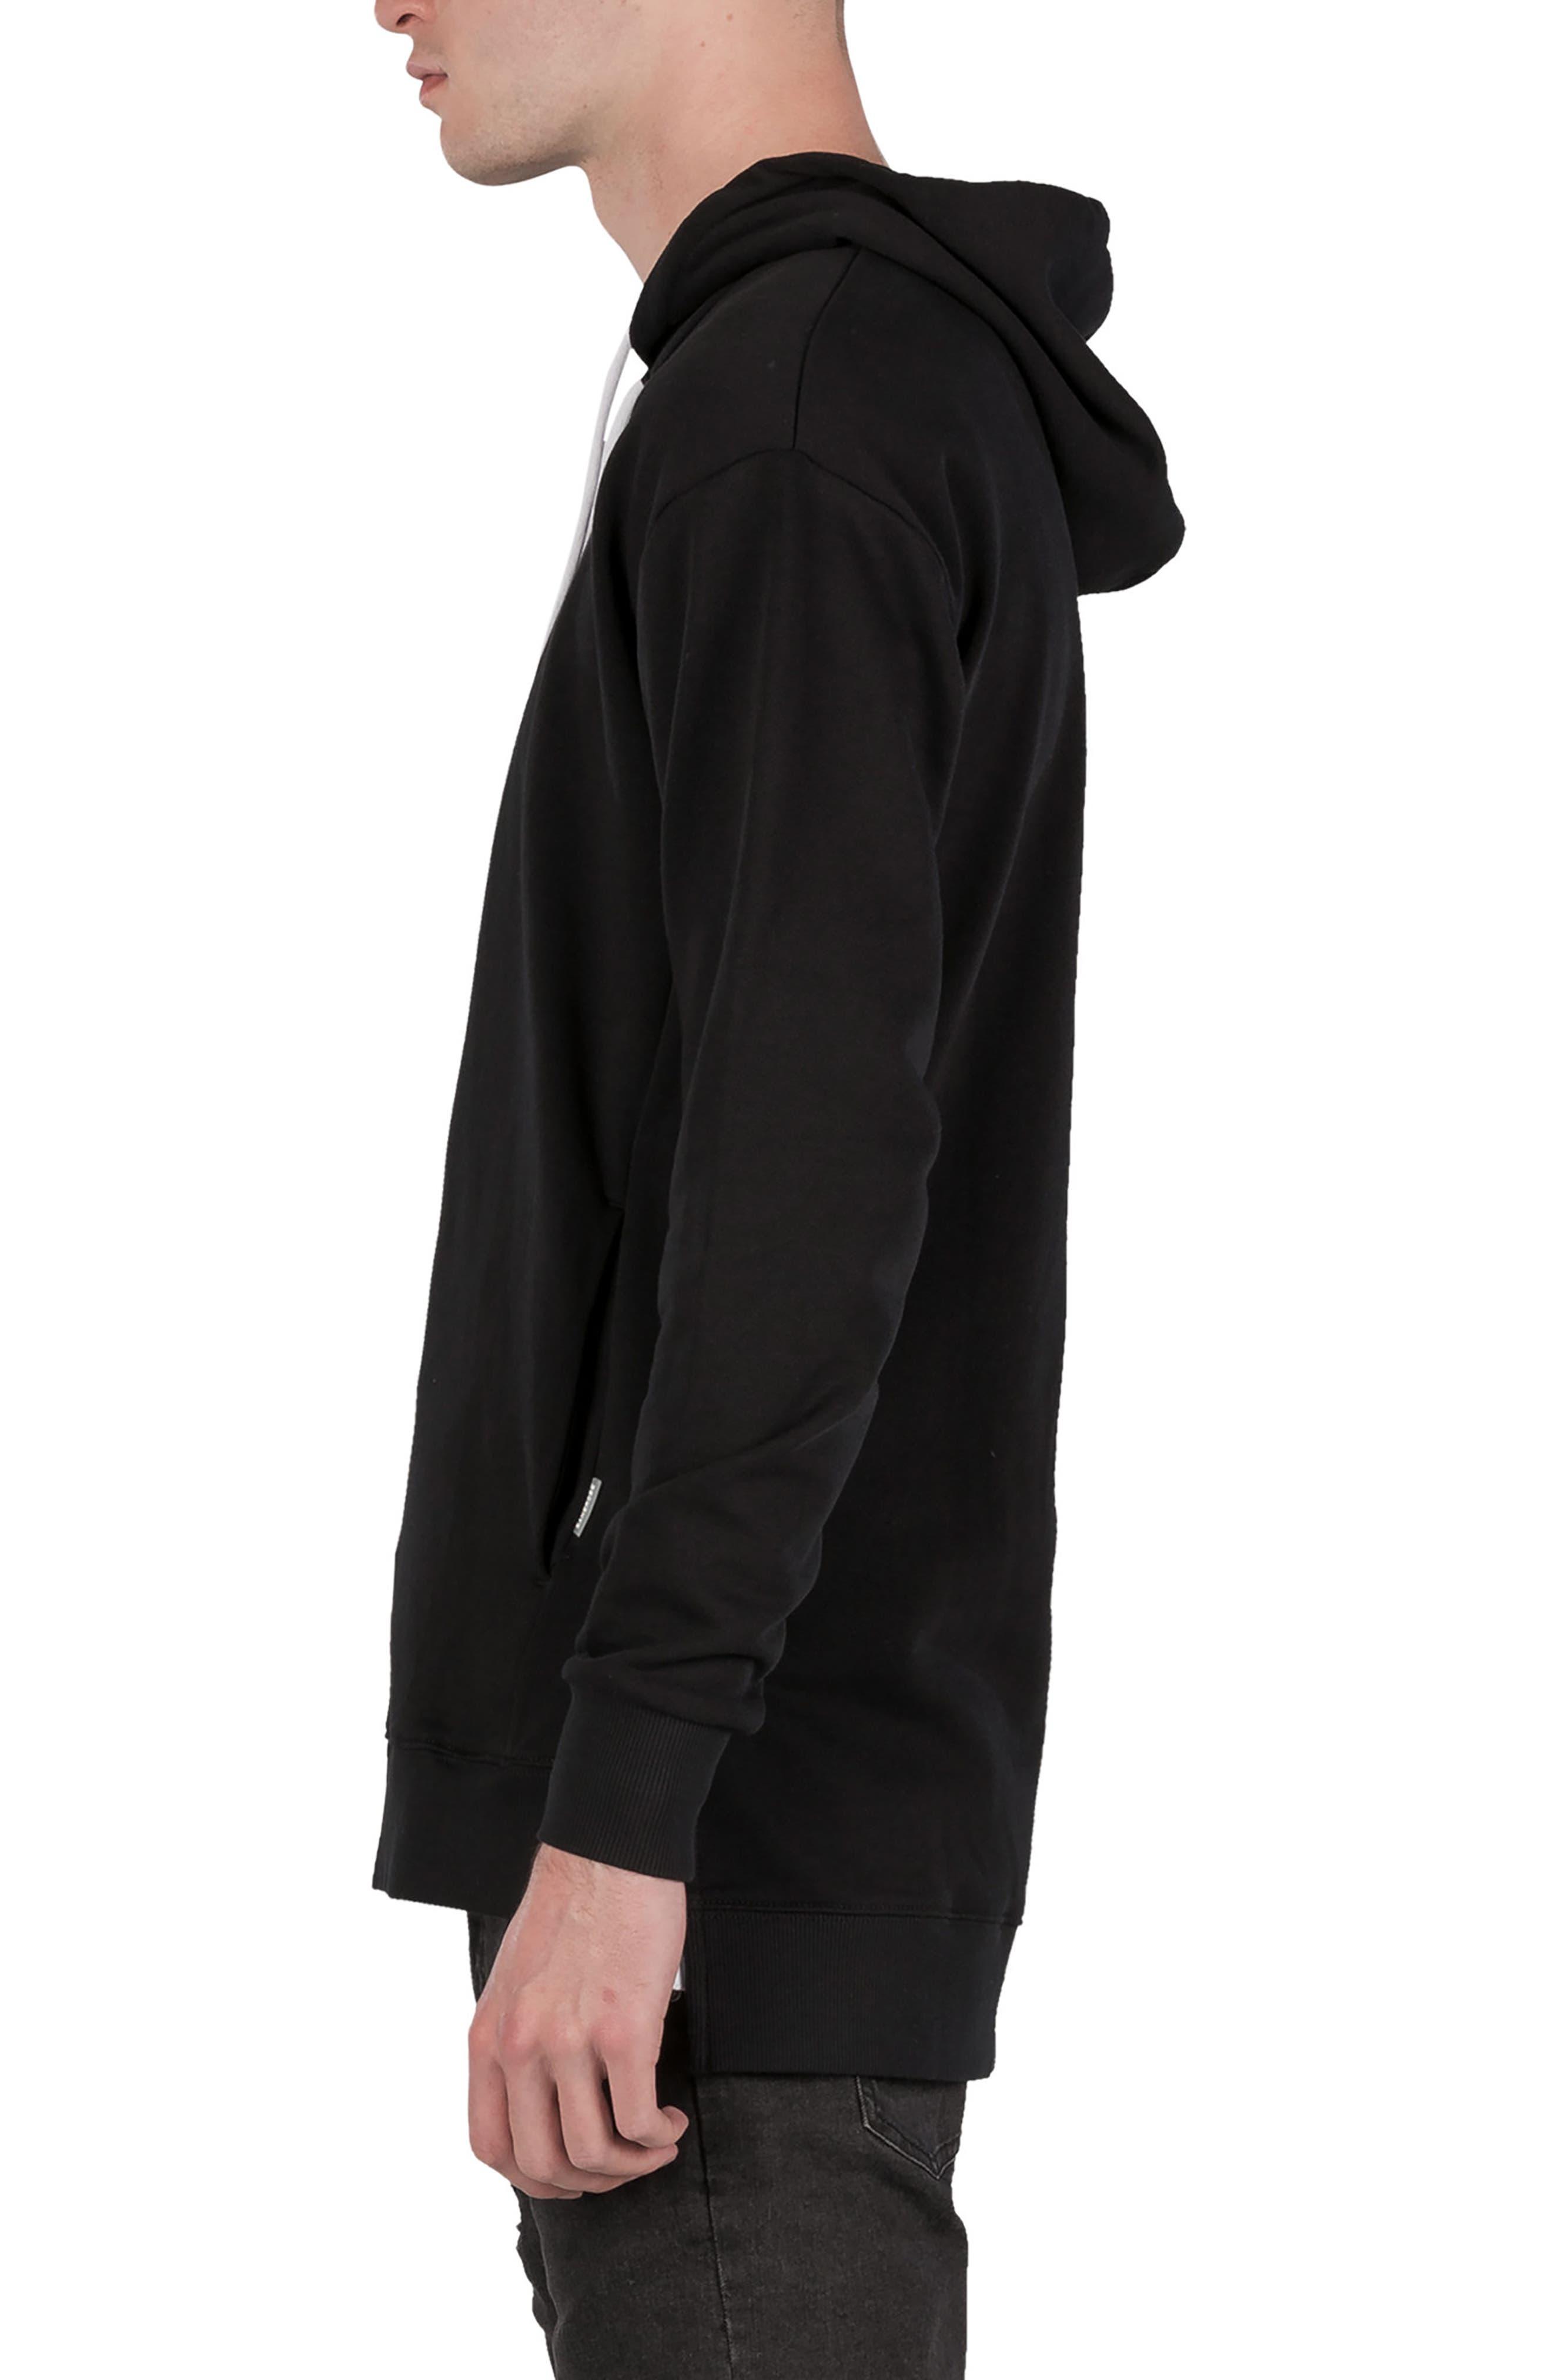 Rugger Hooded Sweatshirt,                             Alternate thumbnail 3, color,                             BLACK